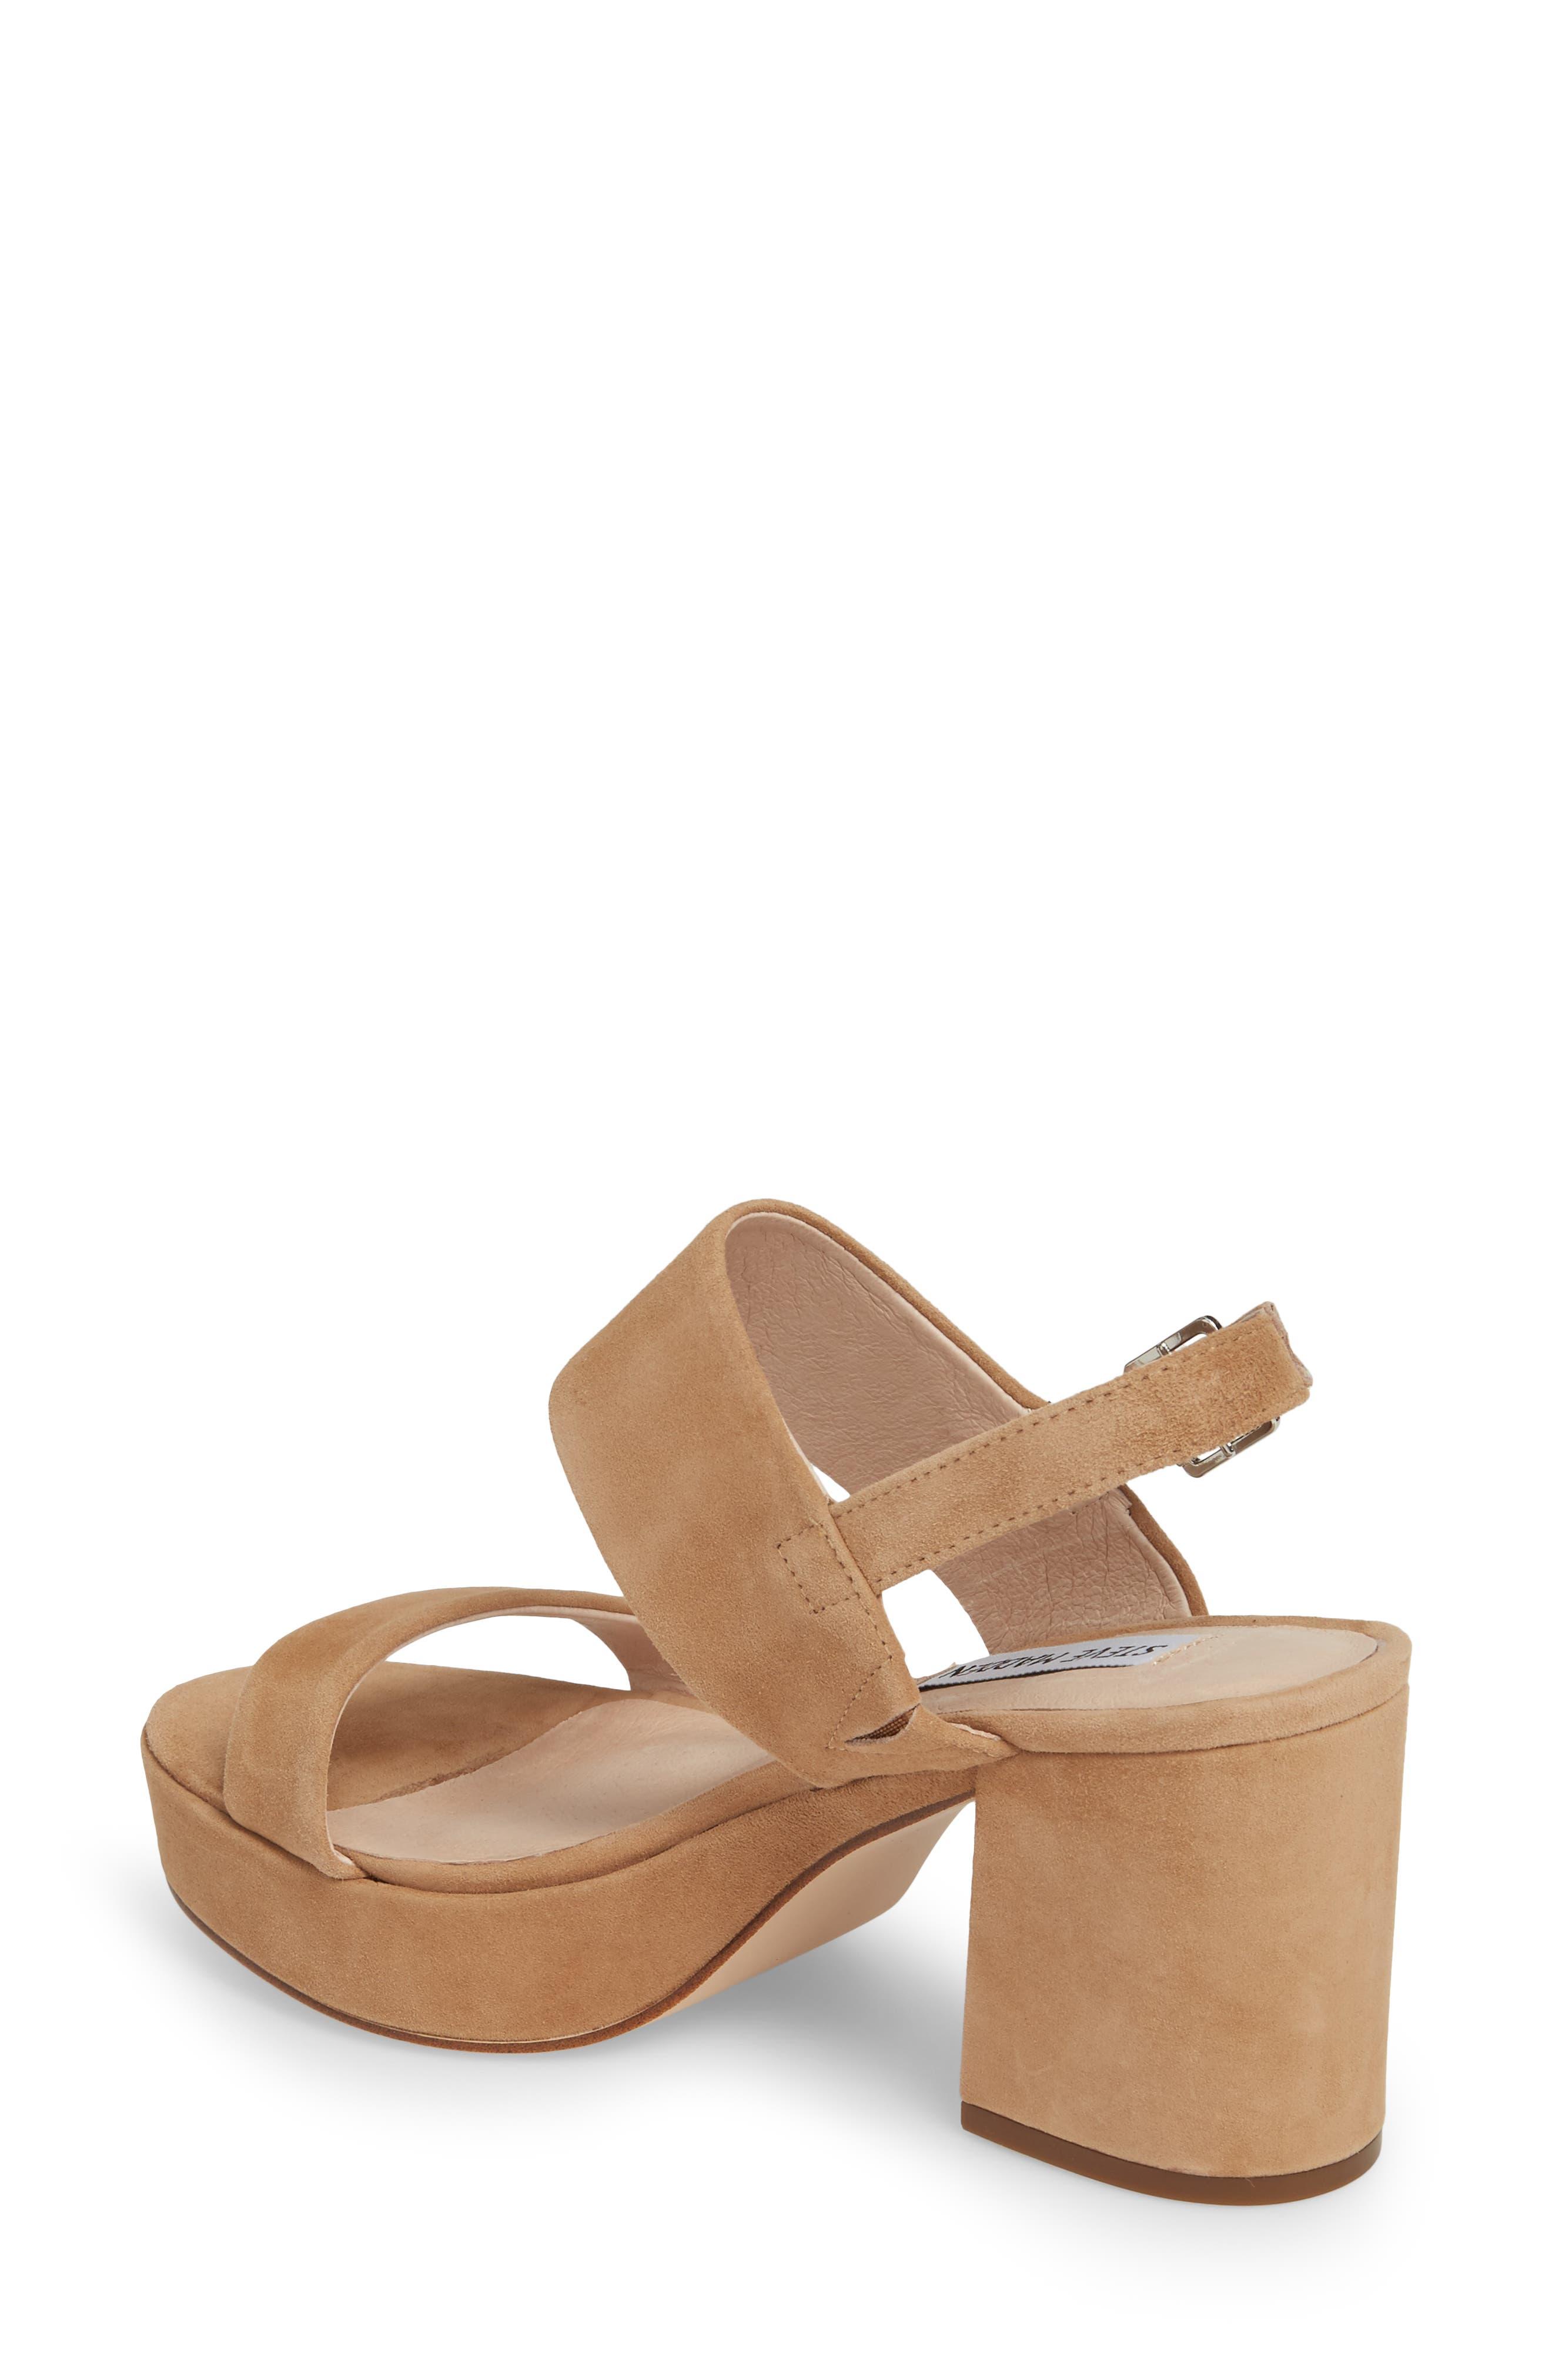 Reba Slingback Platform Sandal,                             Alternate thumbnail 2, color,                             TAN SUEDE